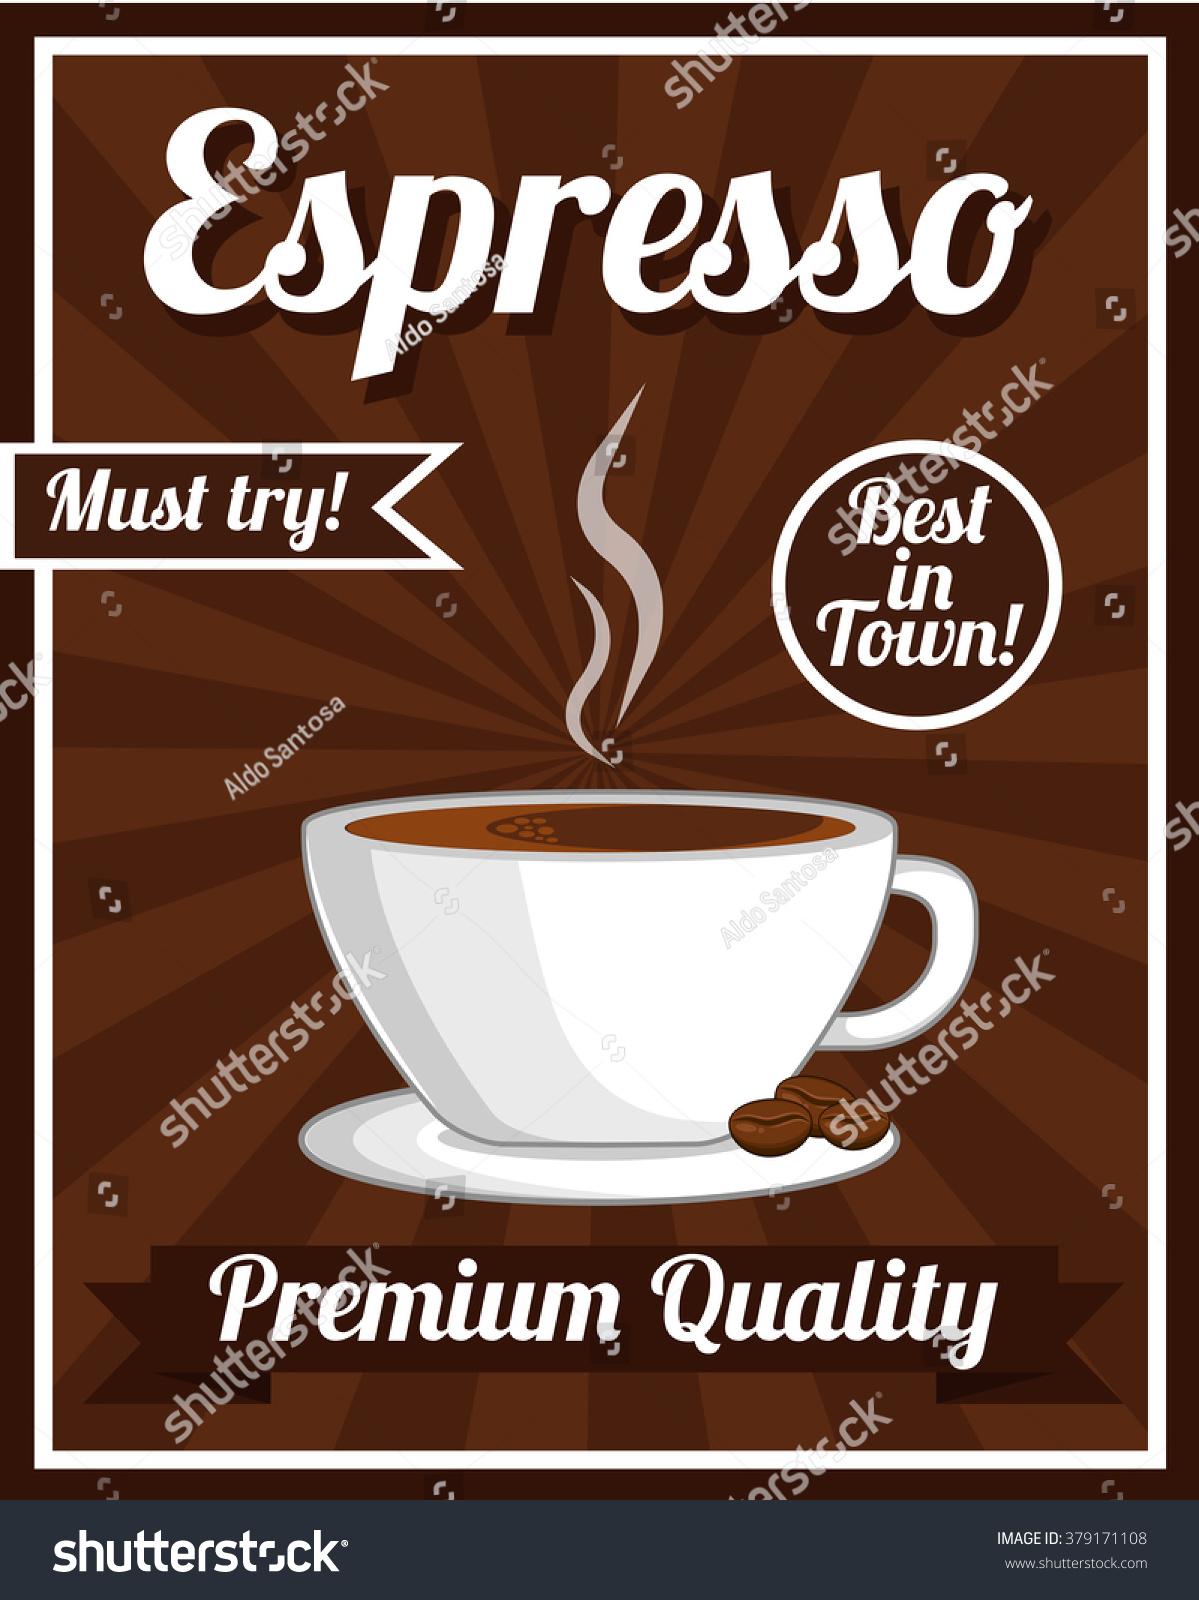 Espresso Poster Stock Vector 379171108 - Shutterstock